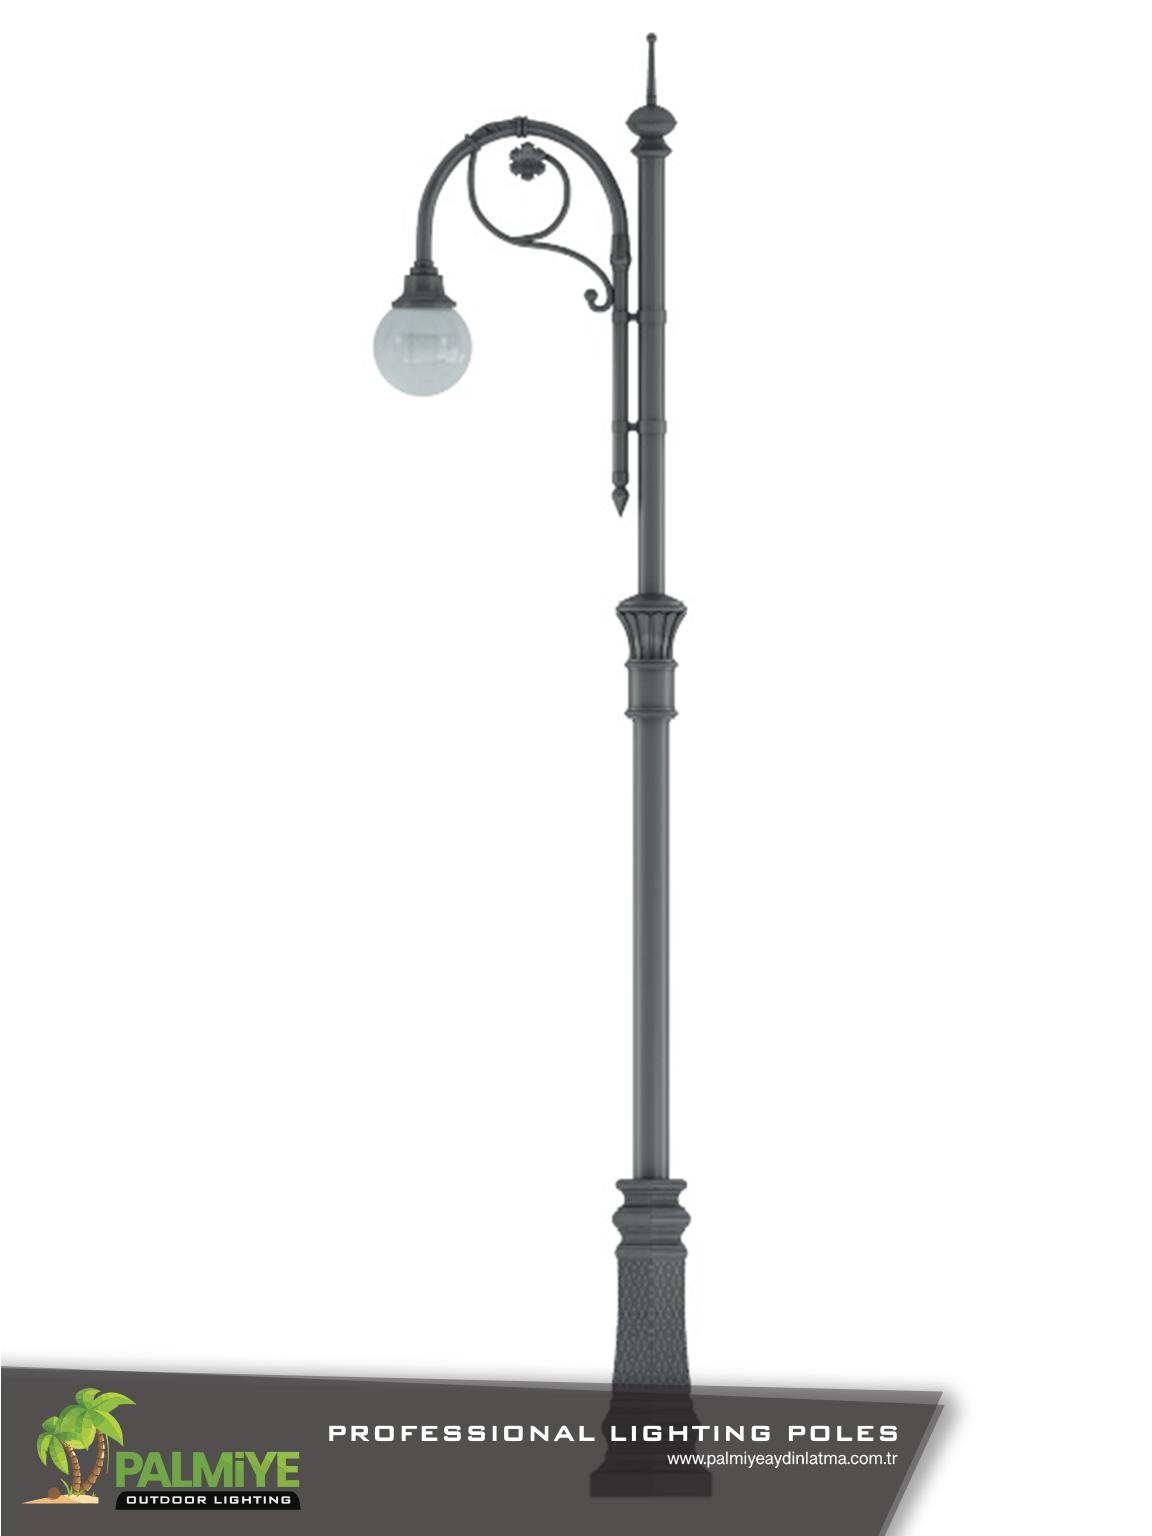 Dekoratif aydınlatma direkleri CİGNO V1